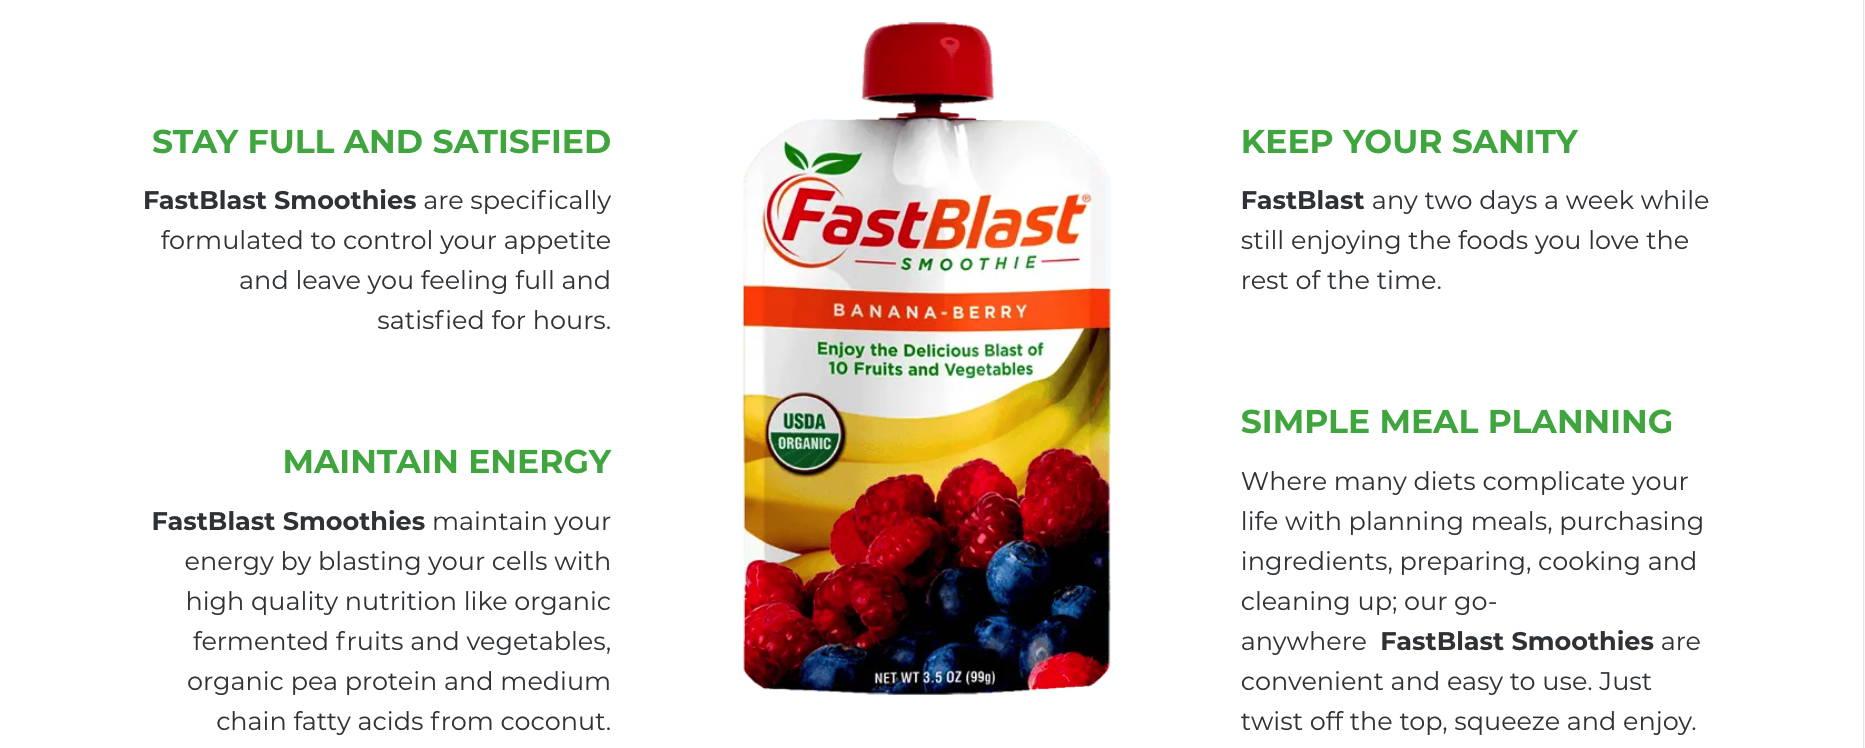 infographic of fast blast smoothie benefits